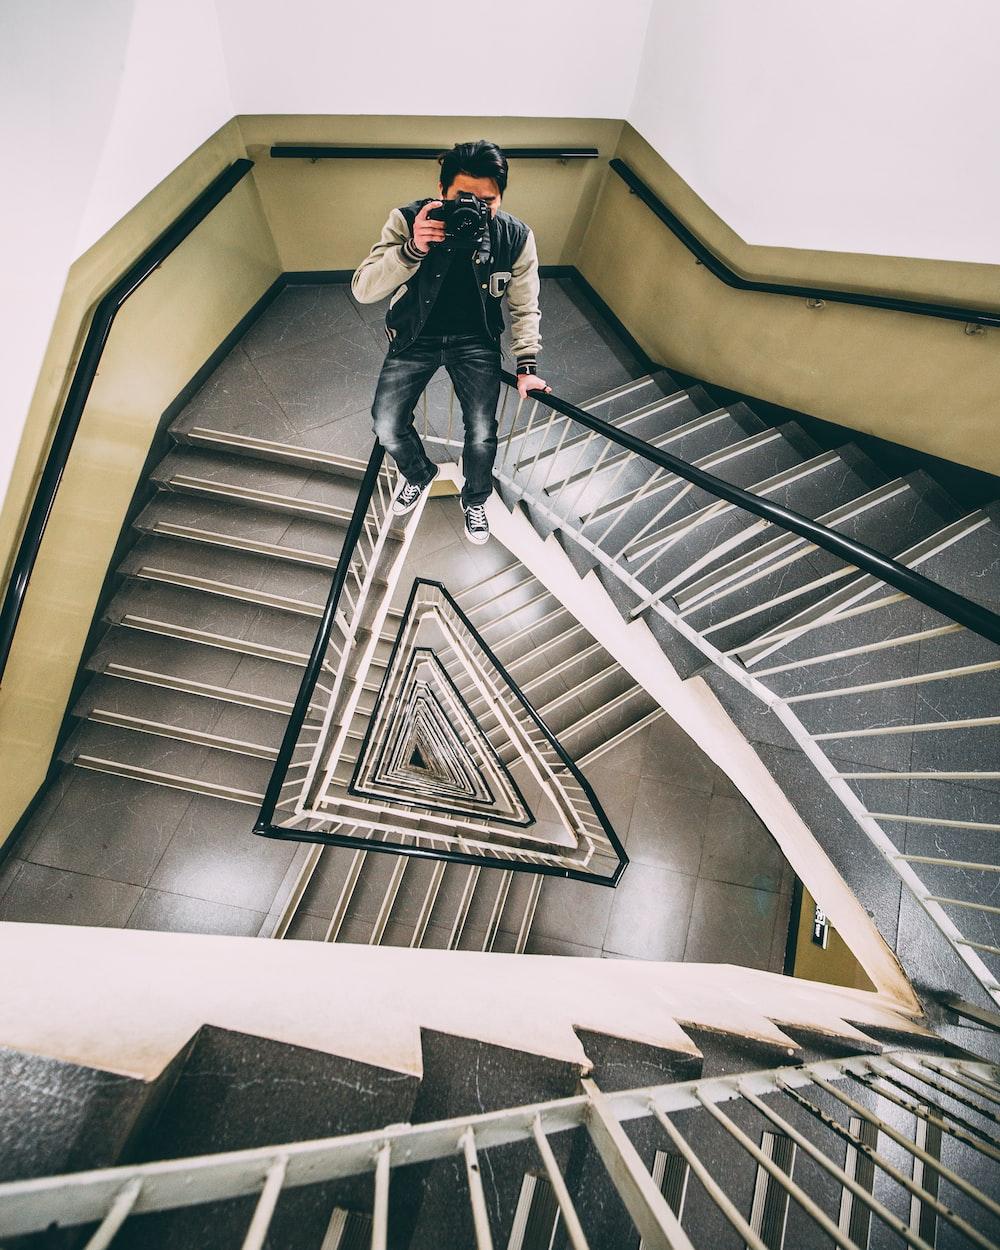 man sitting on stair rail holding DSLR camera